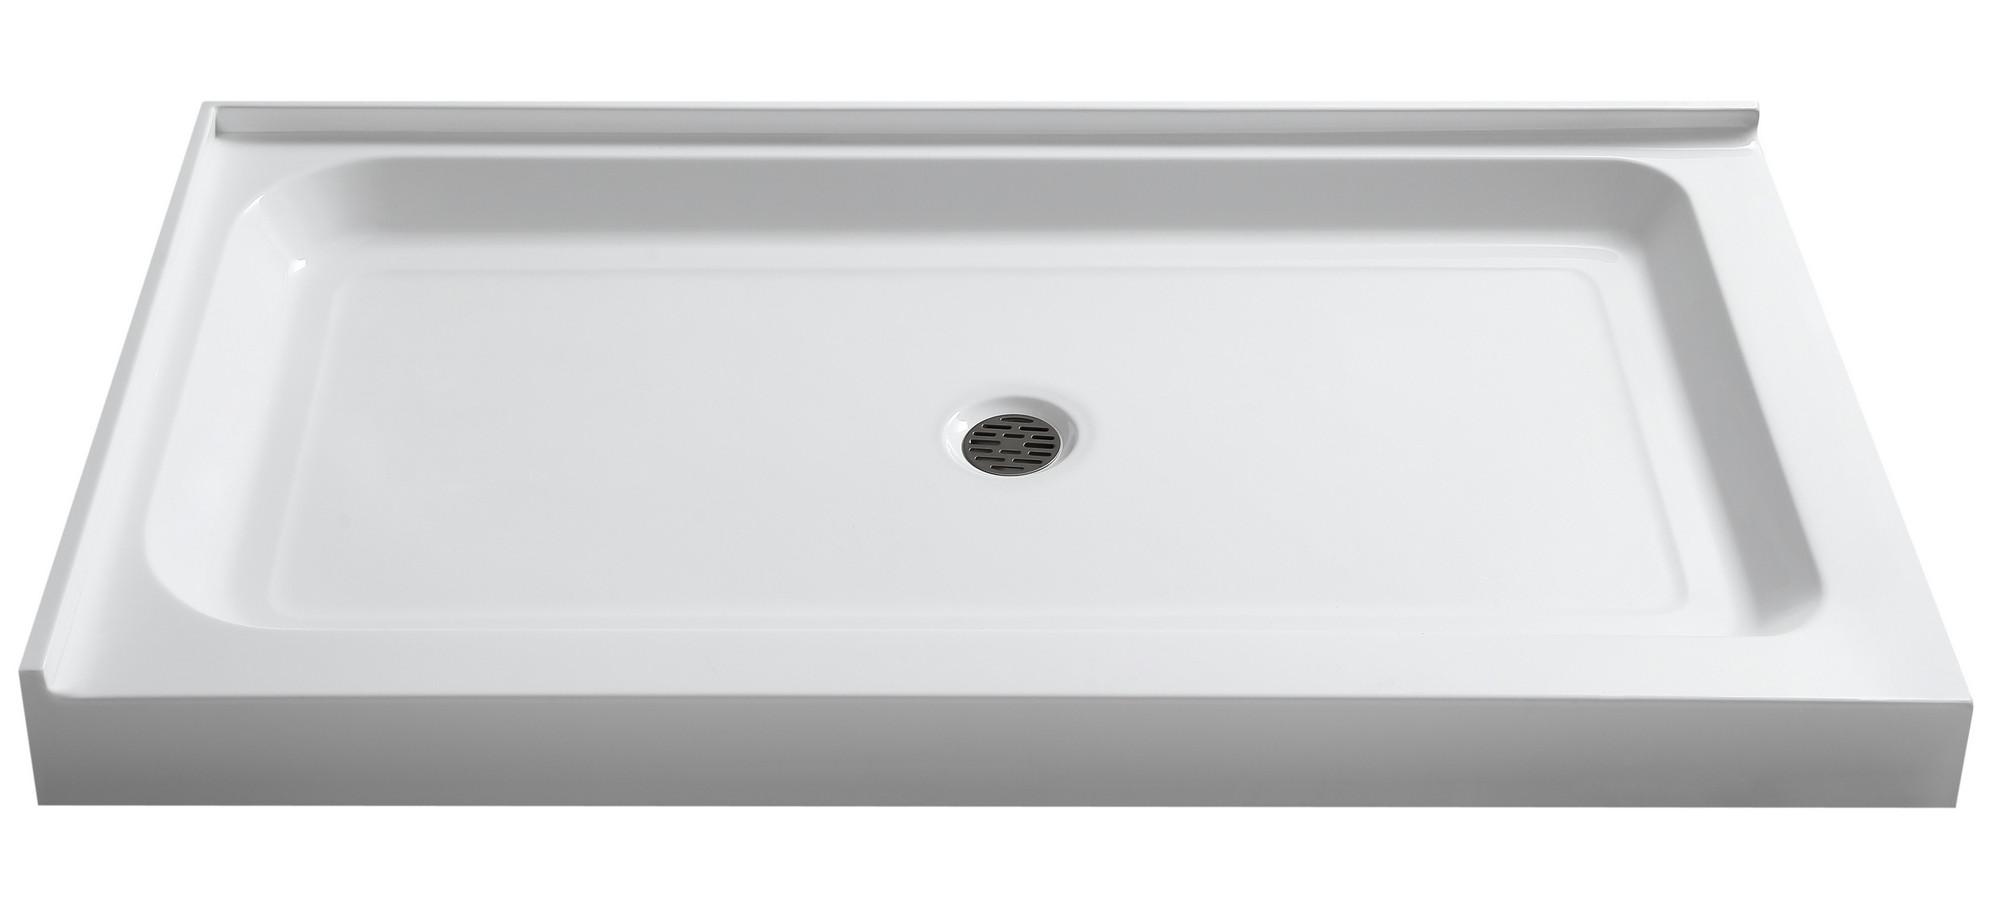 Anzzi SB-AZ022R Vail 36 x 48 in. Double Threshold Shower Base in White